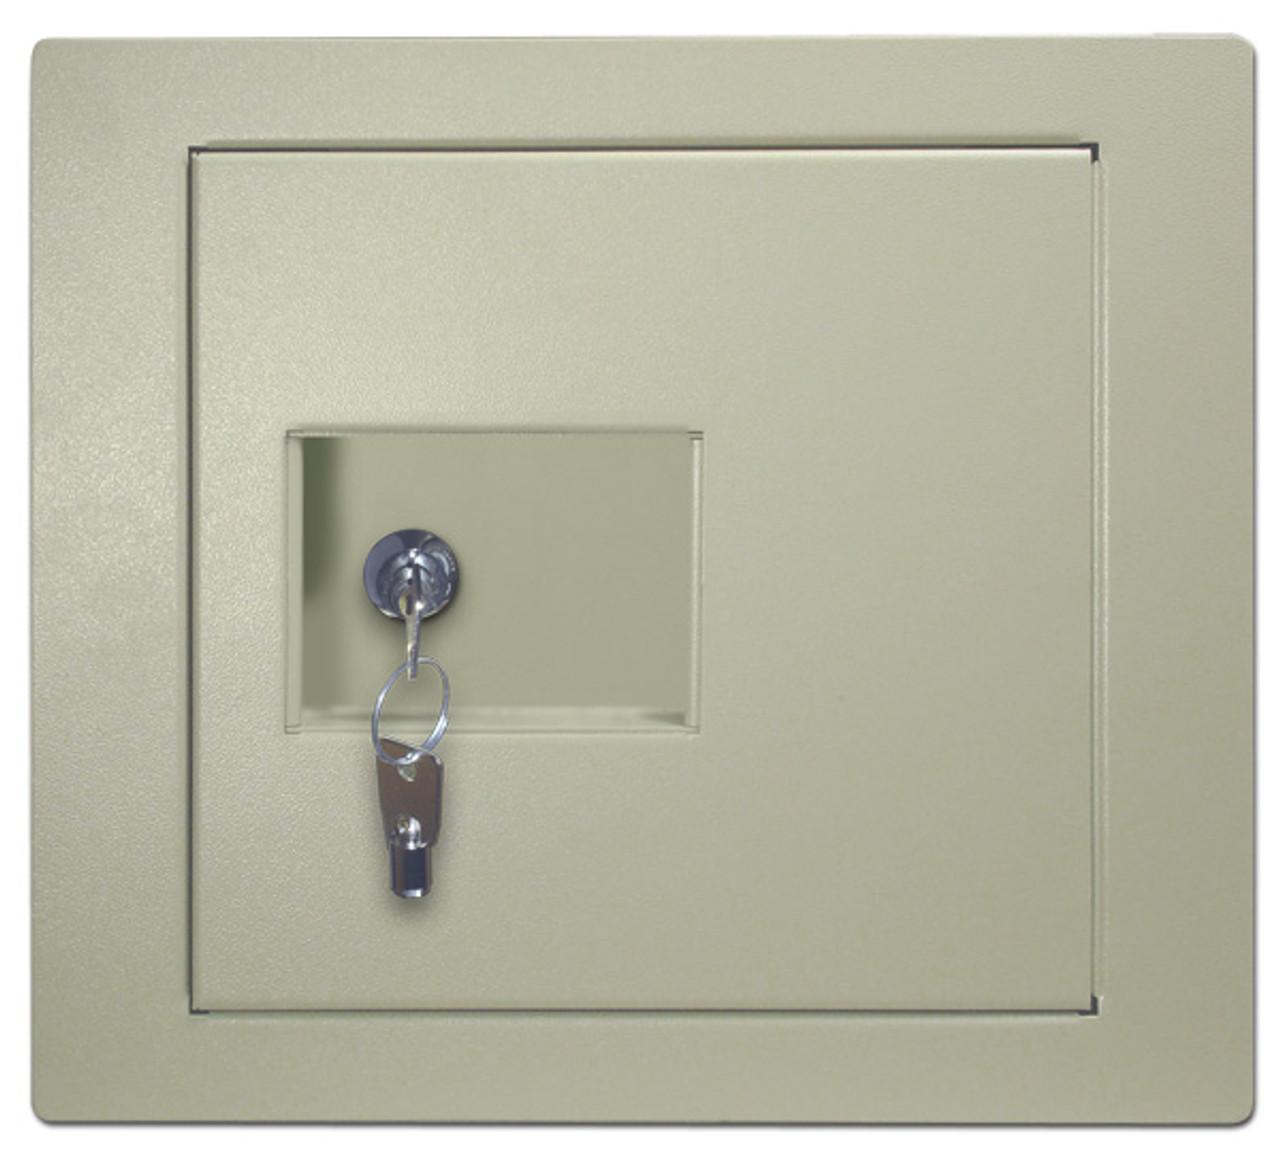 HPC WS-200 Large Wall Safe with Tubular Lock